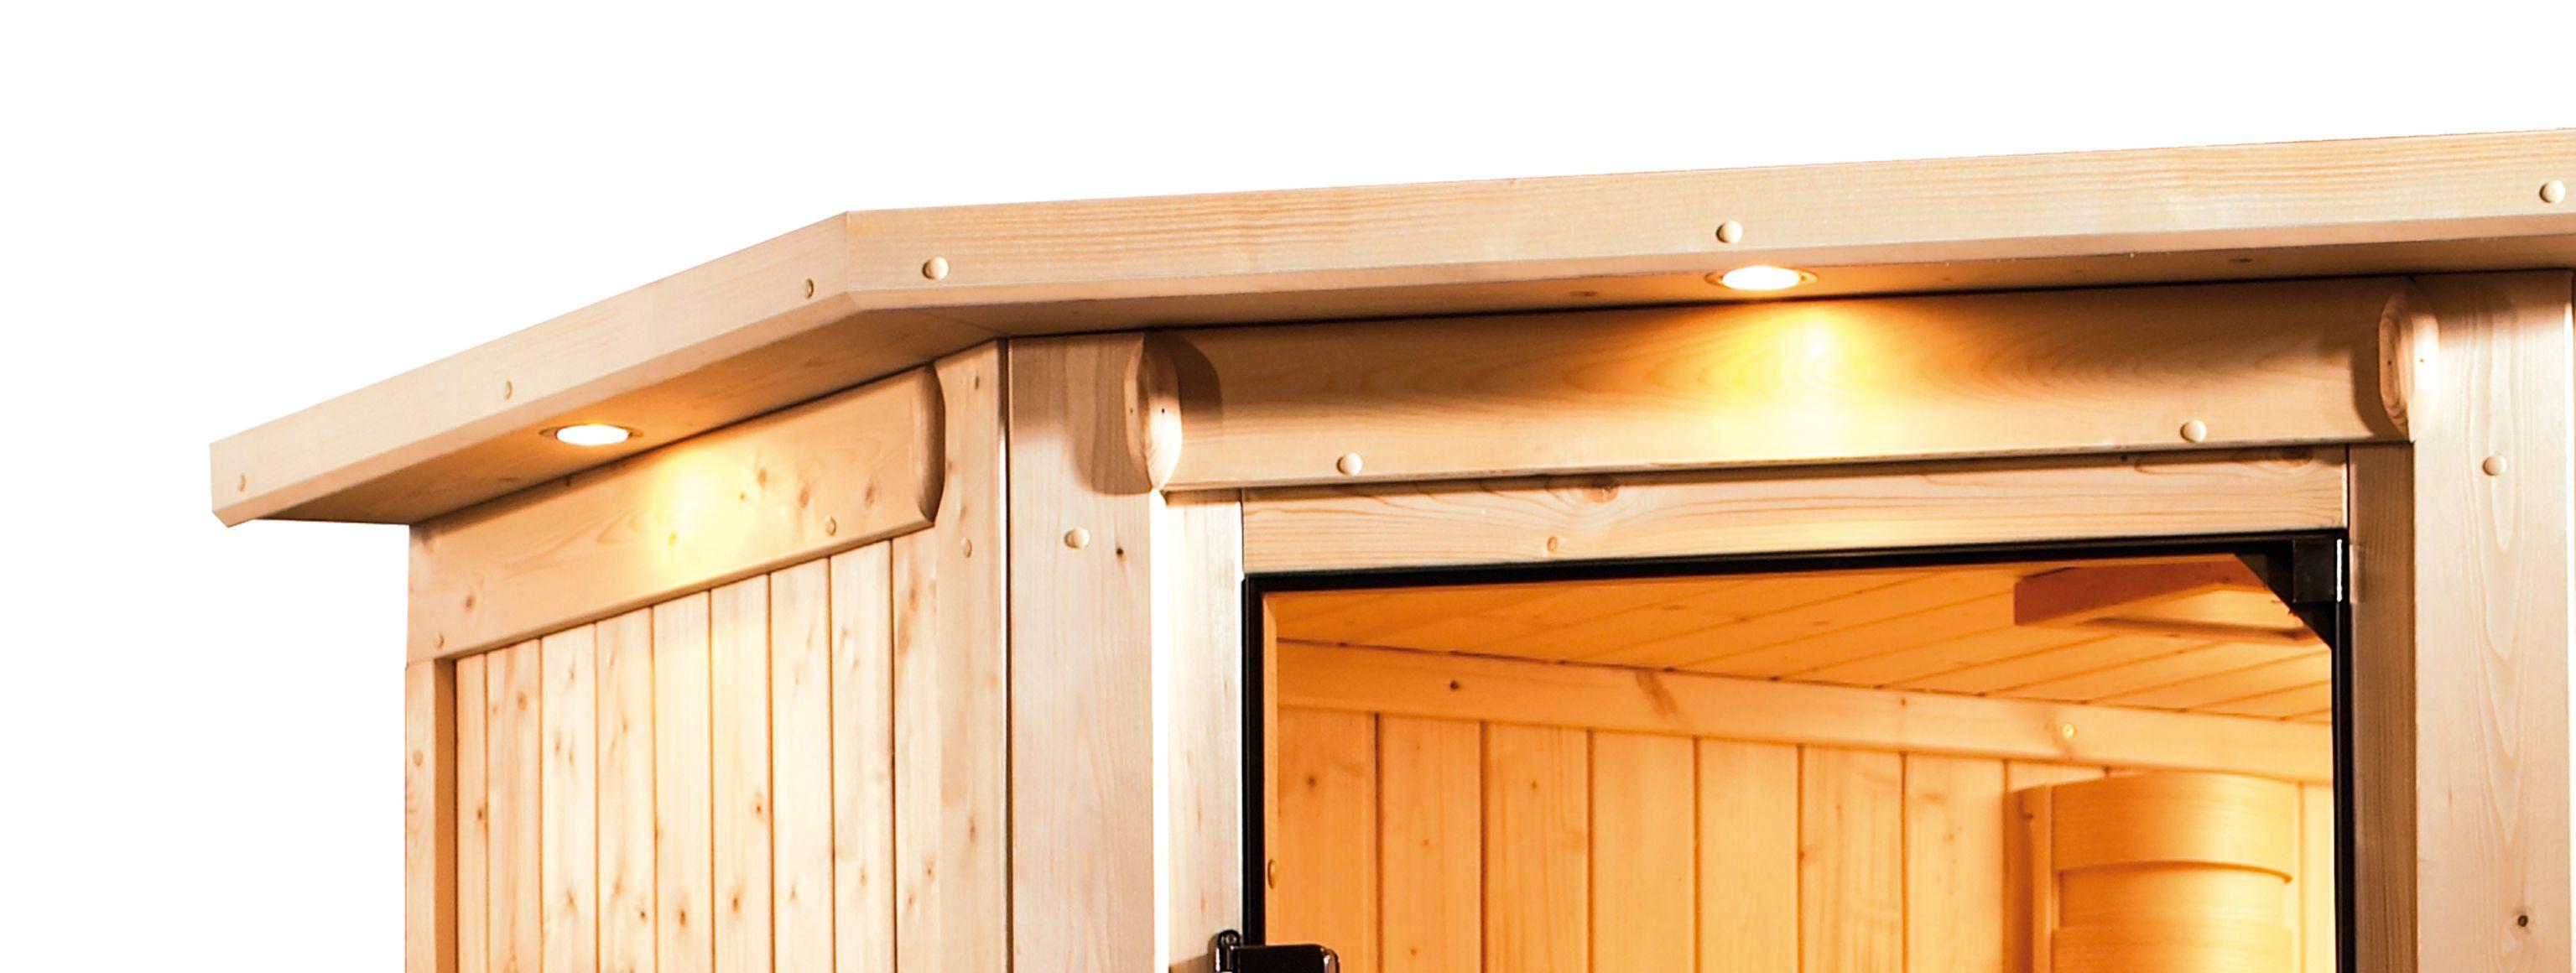 Woodfeeling Sauna Elea 38mm Dachkranz Bio Saunaofen 9kW extern Bild 11